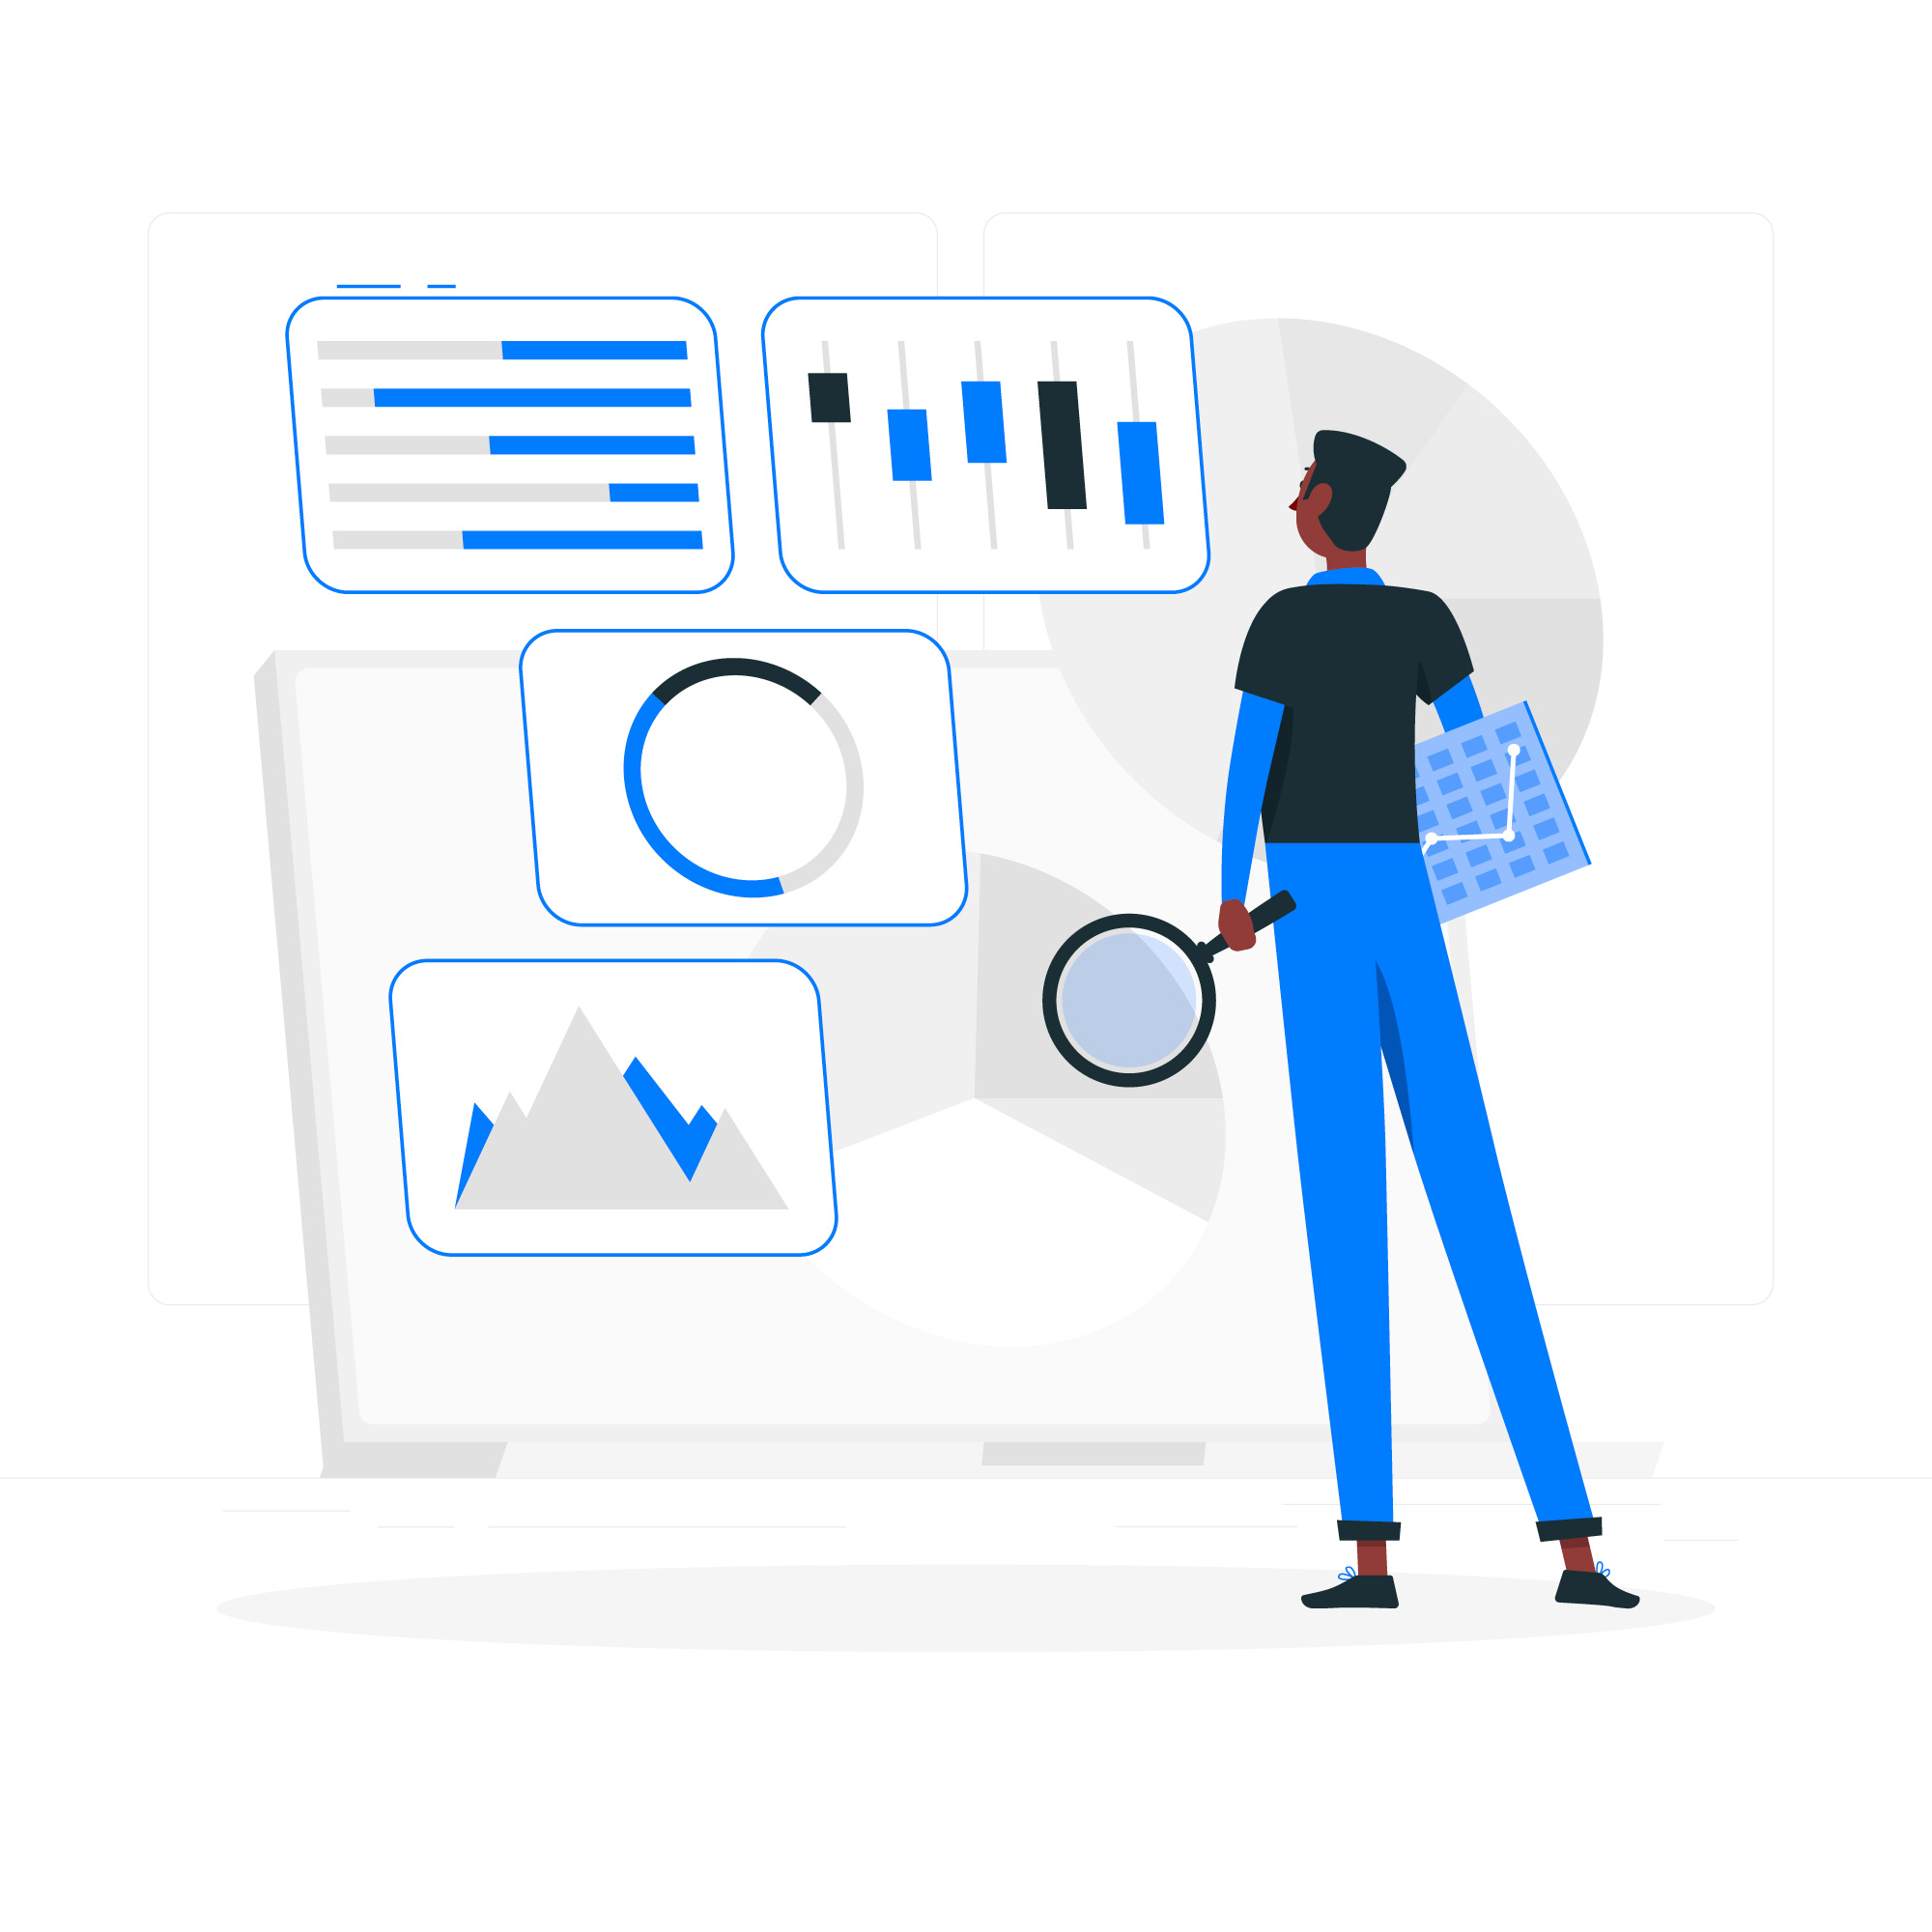 App Traffic Analyse